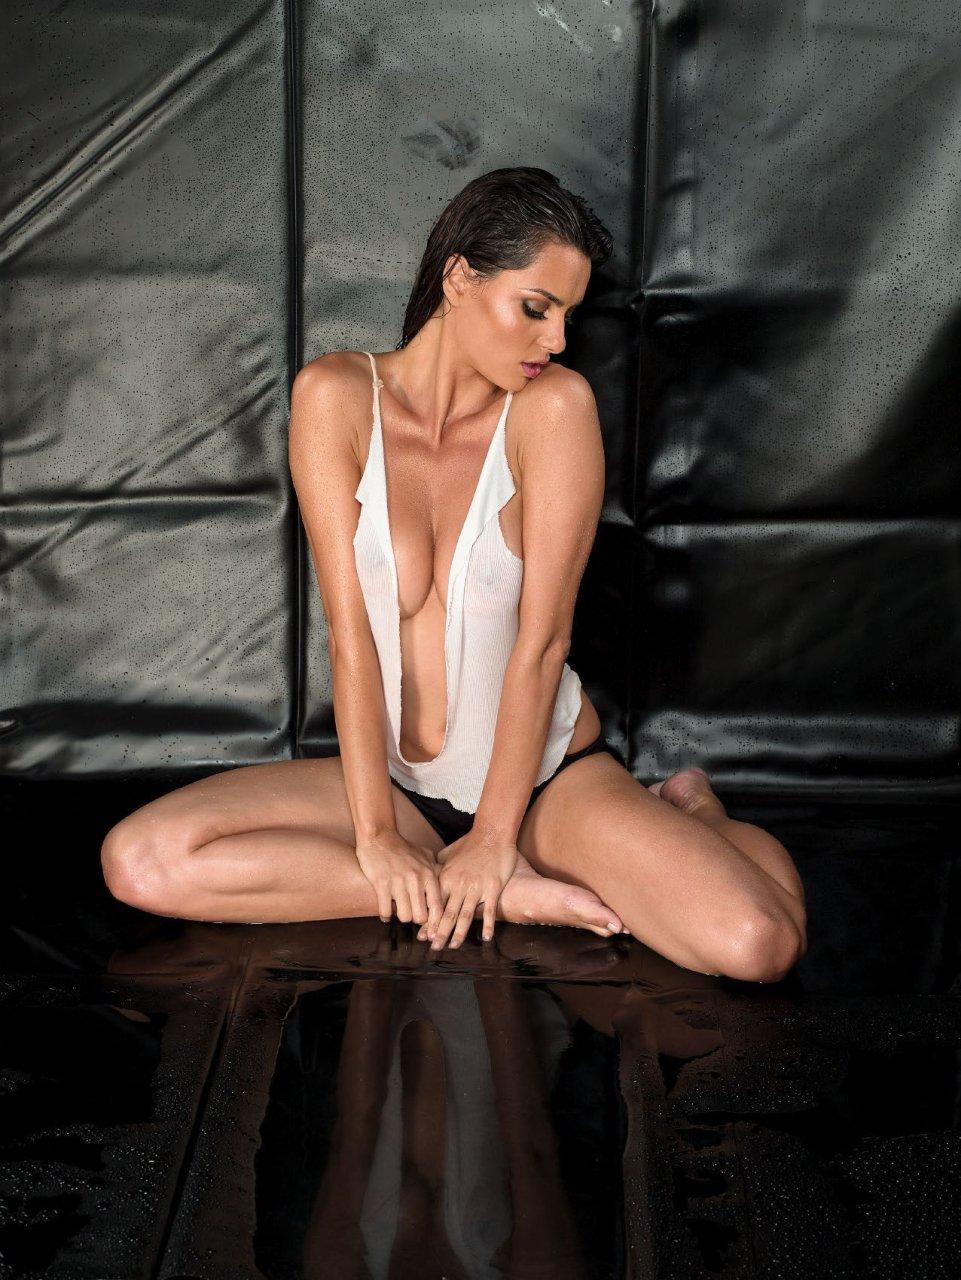 catrinel marlon nude